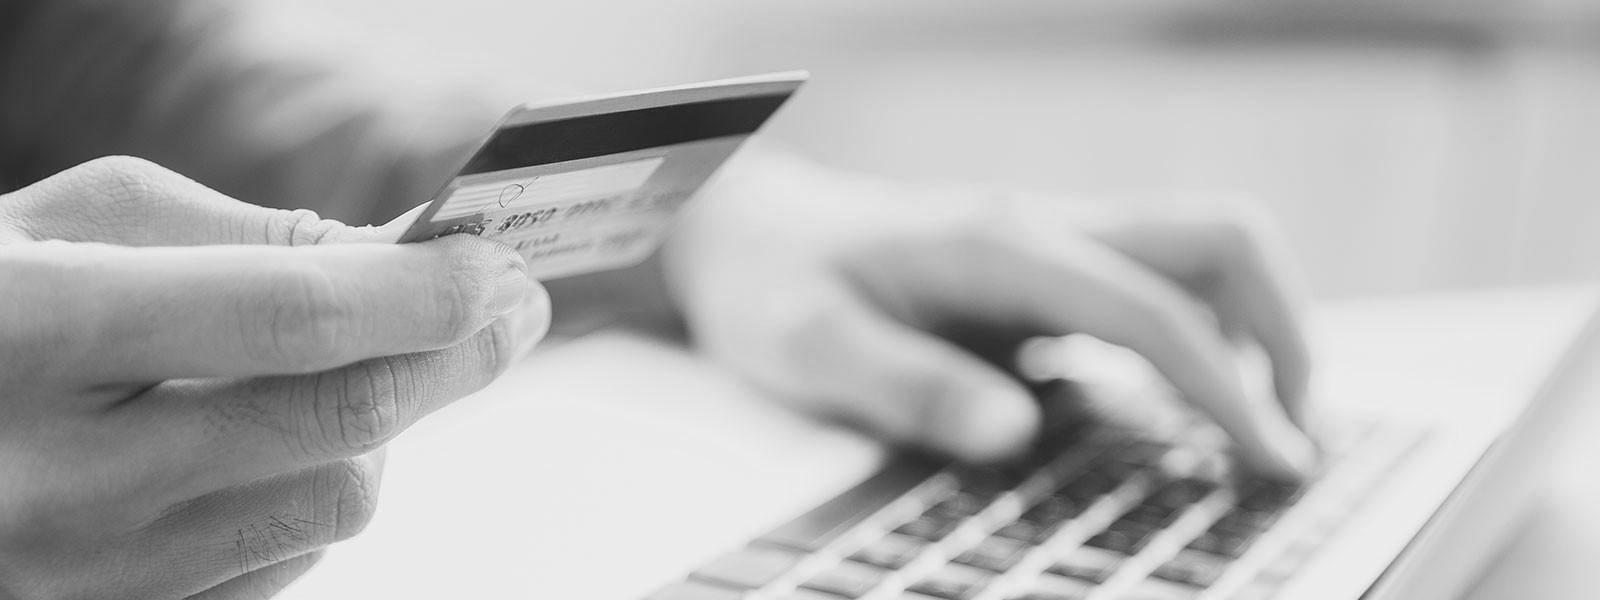 Paying by credit card through laptop